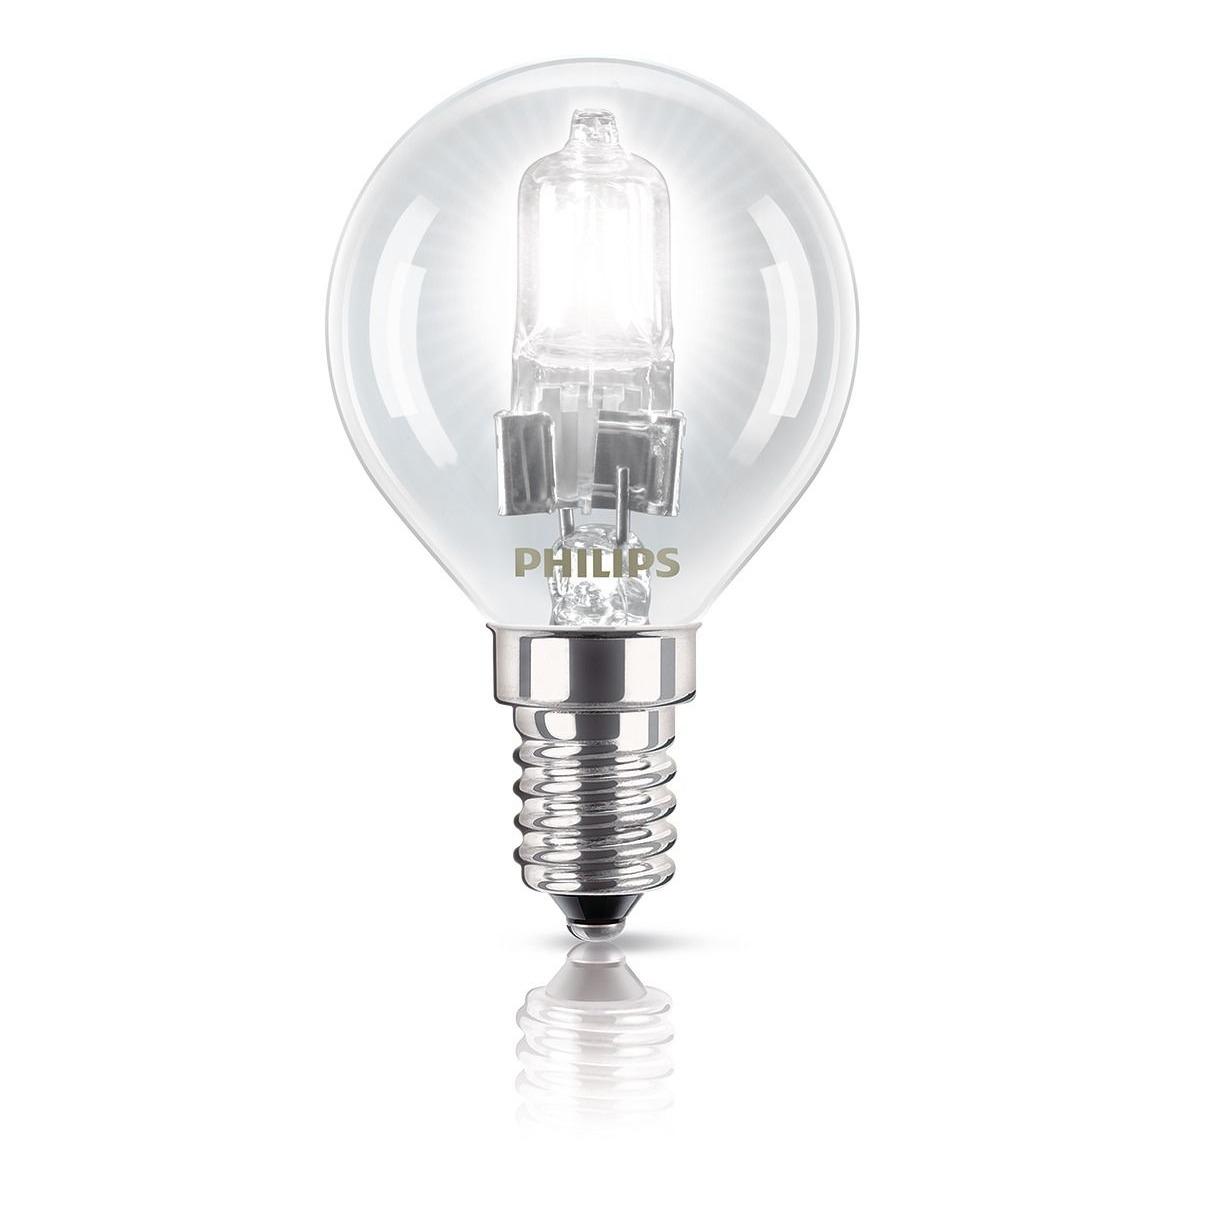 philips EcoClassic Lustre lamp